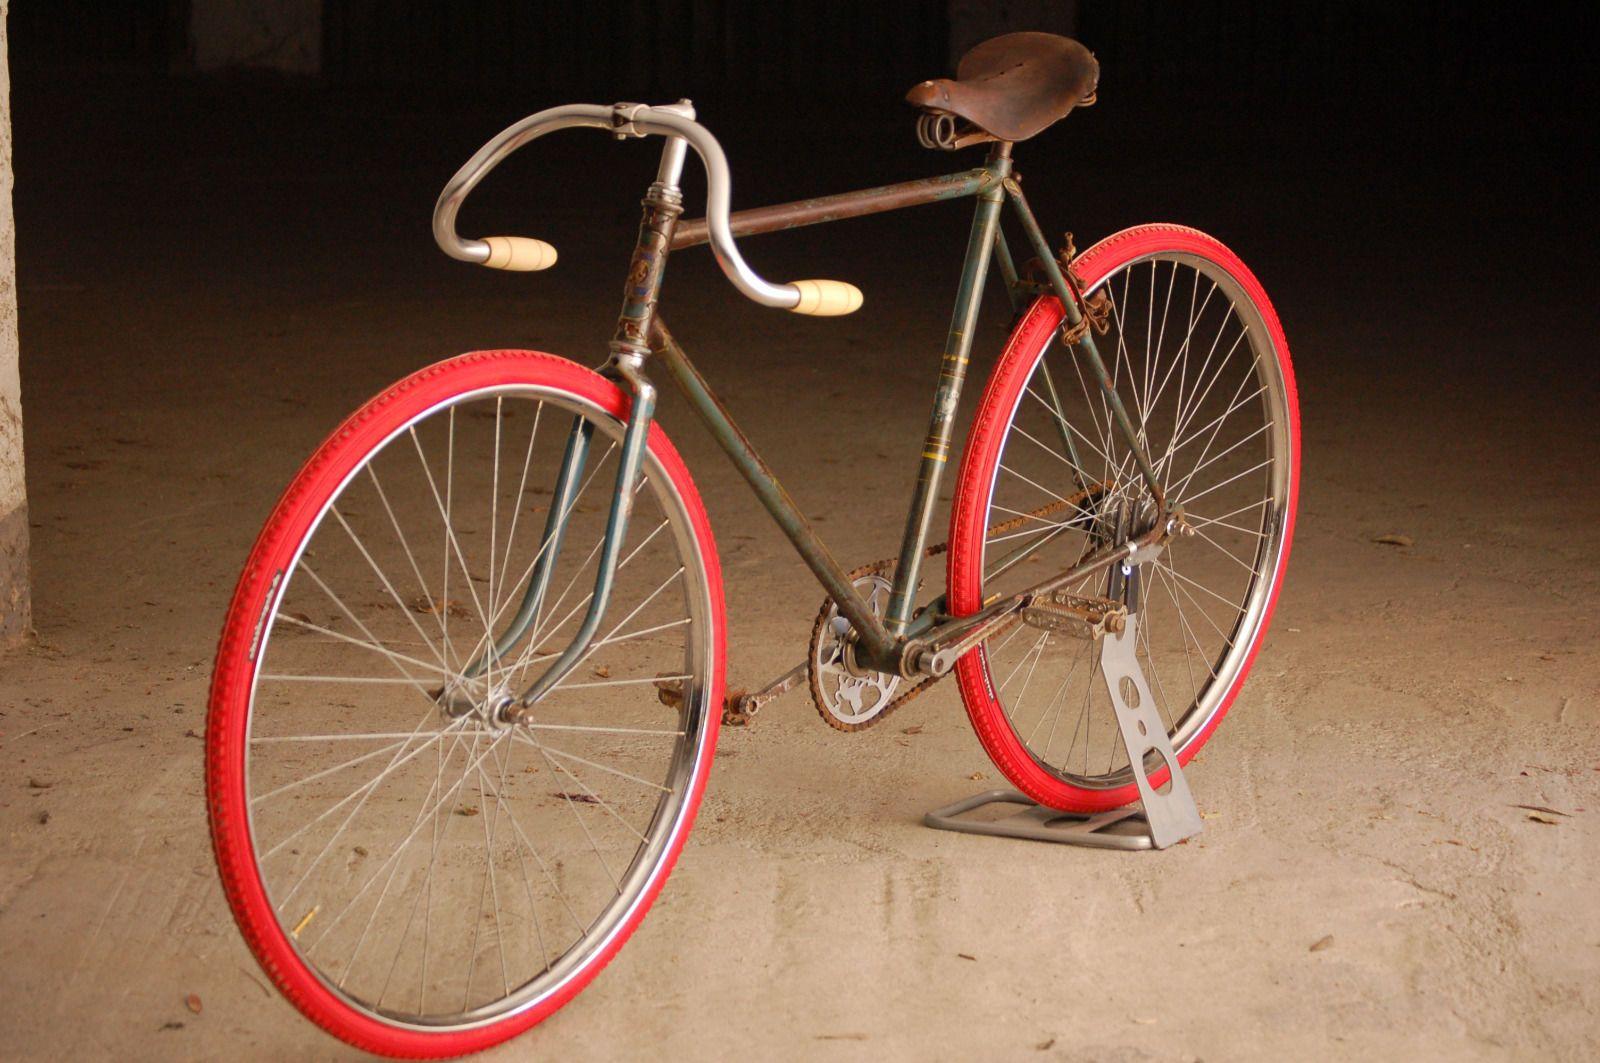 Bici Corsa Epoca Peugeot 1920 30 Bicicletta D Epoca Old Racer